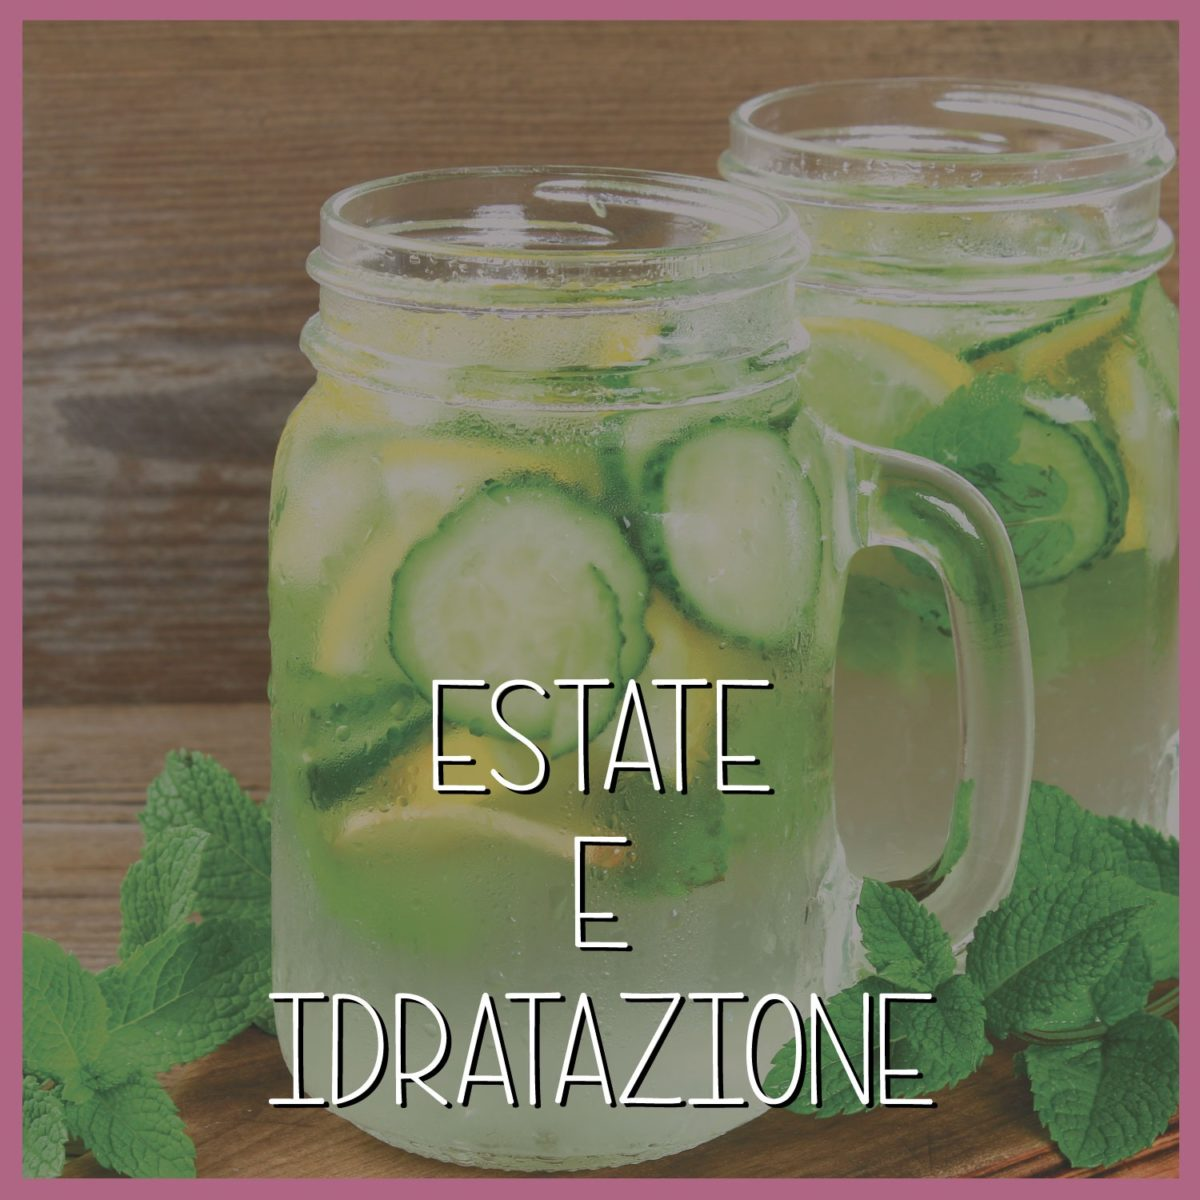 Estate-e-idratazione-2-1200x1200.jpeg